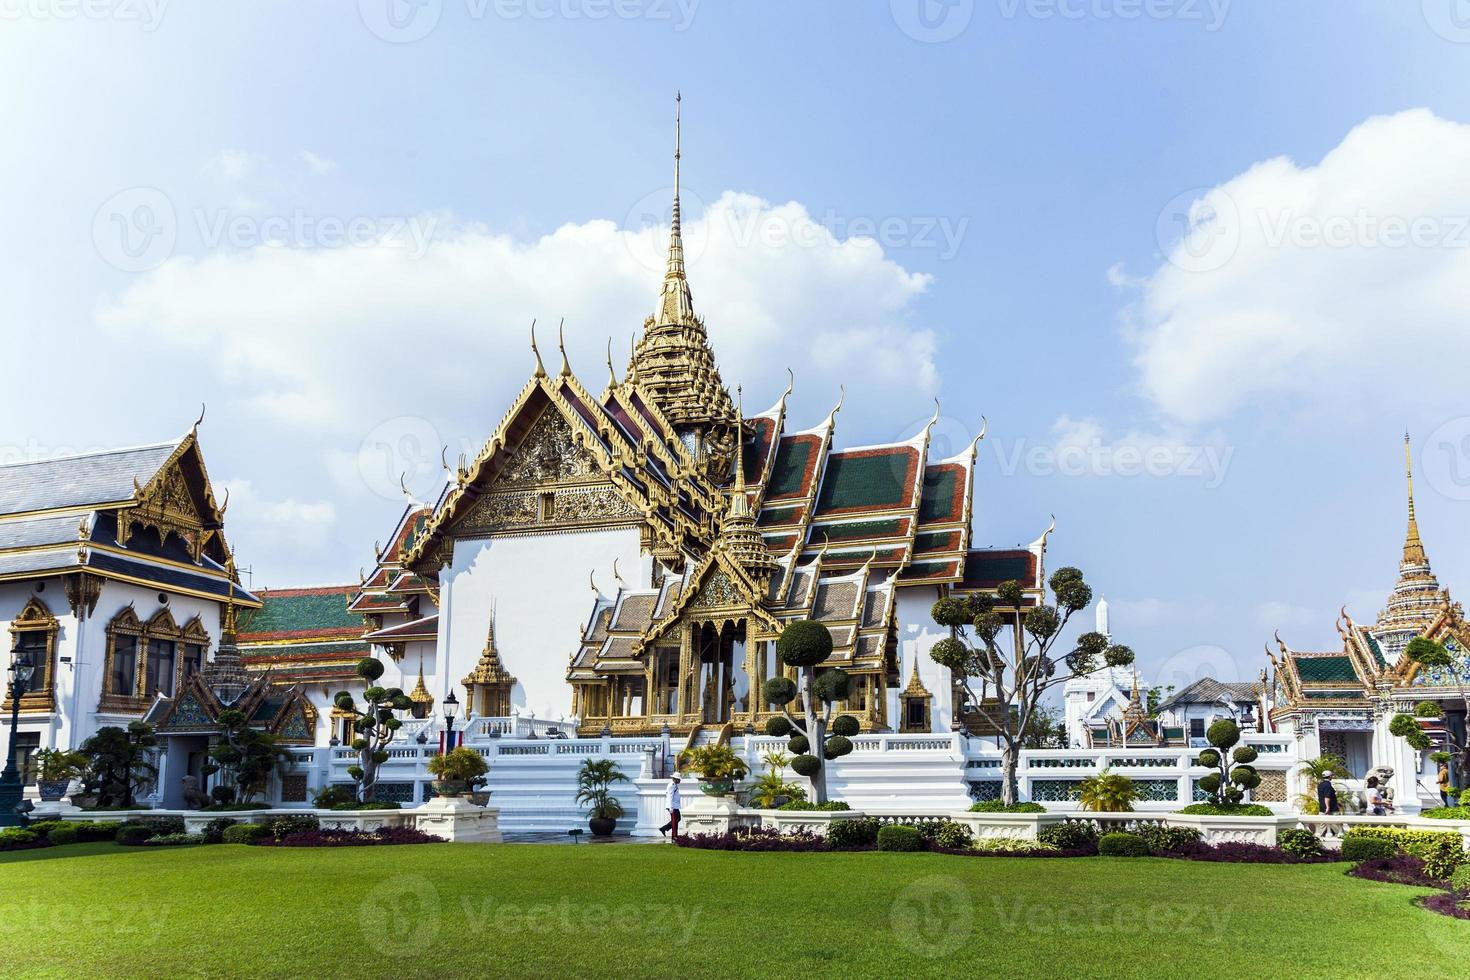 phra tinang aporn phimok prasat paviljong i det stora palatset foto